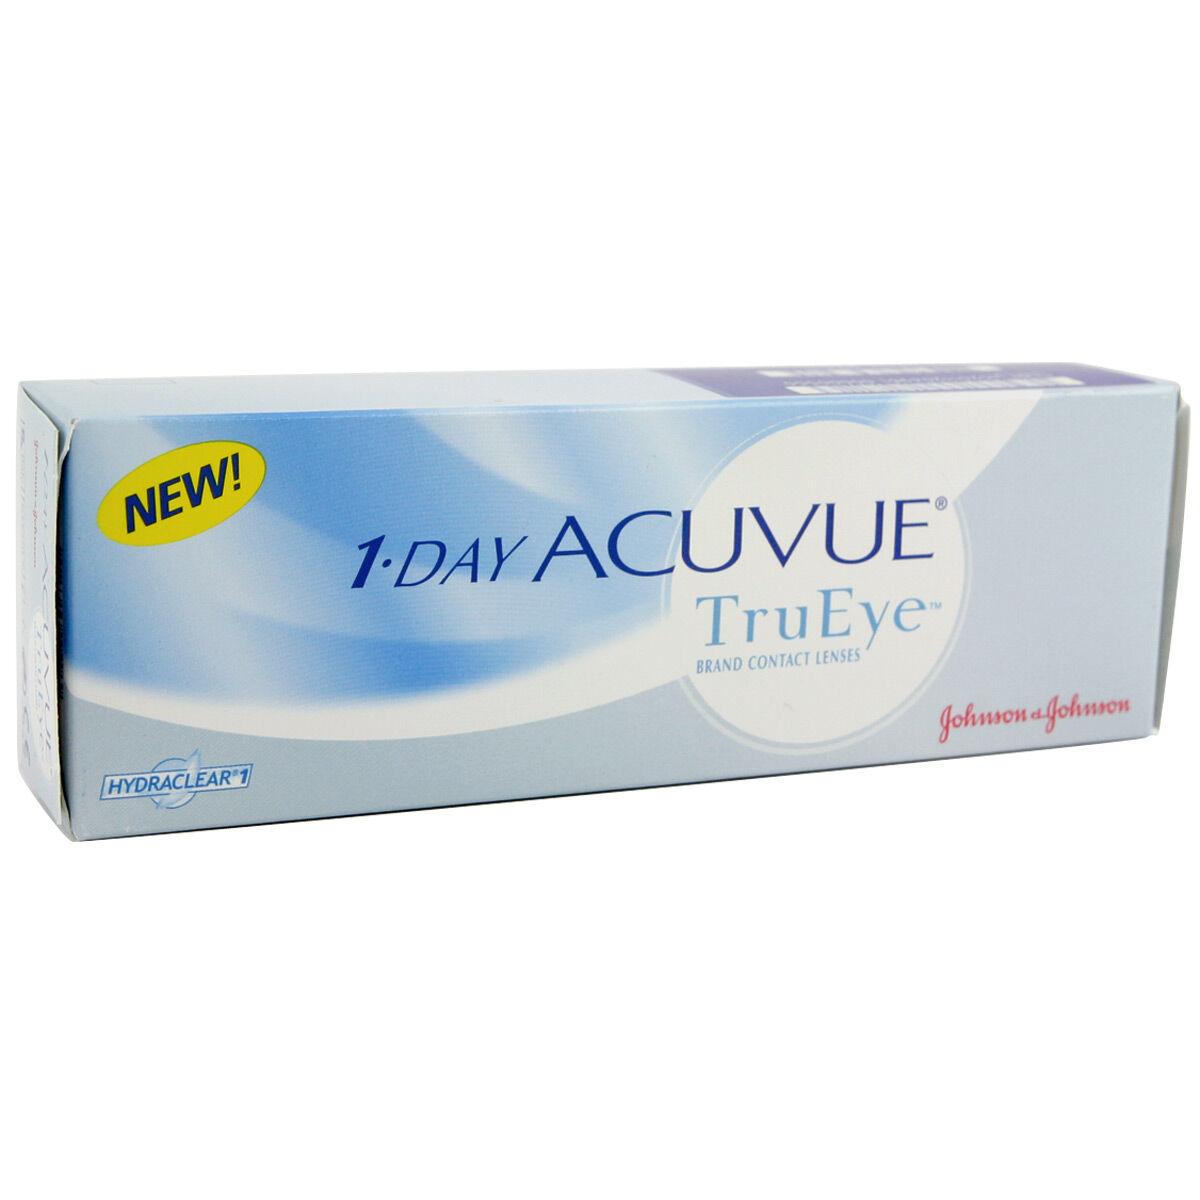 Acuvue 1 Day Acuvue Trueye (30 Contact Lenses), Johnson & Johnson Daily Lenses, Narafilcon A